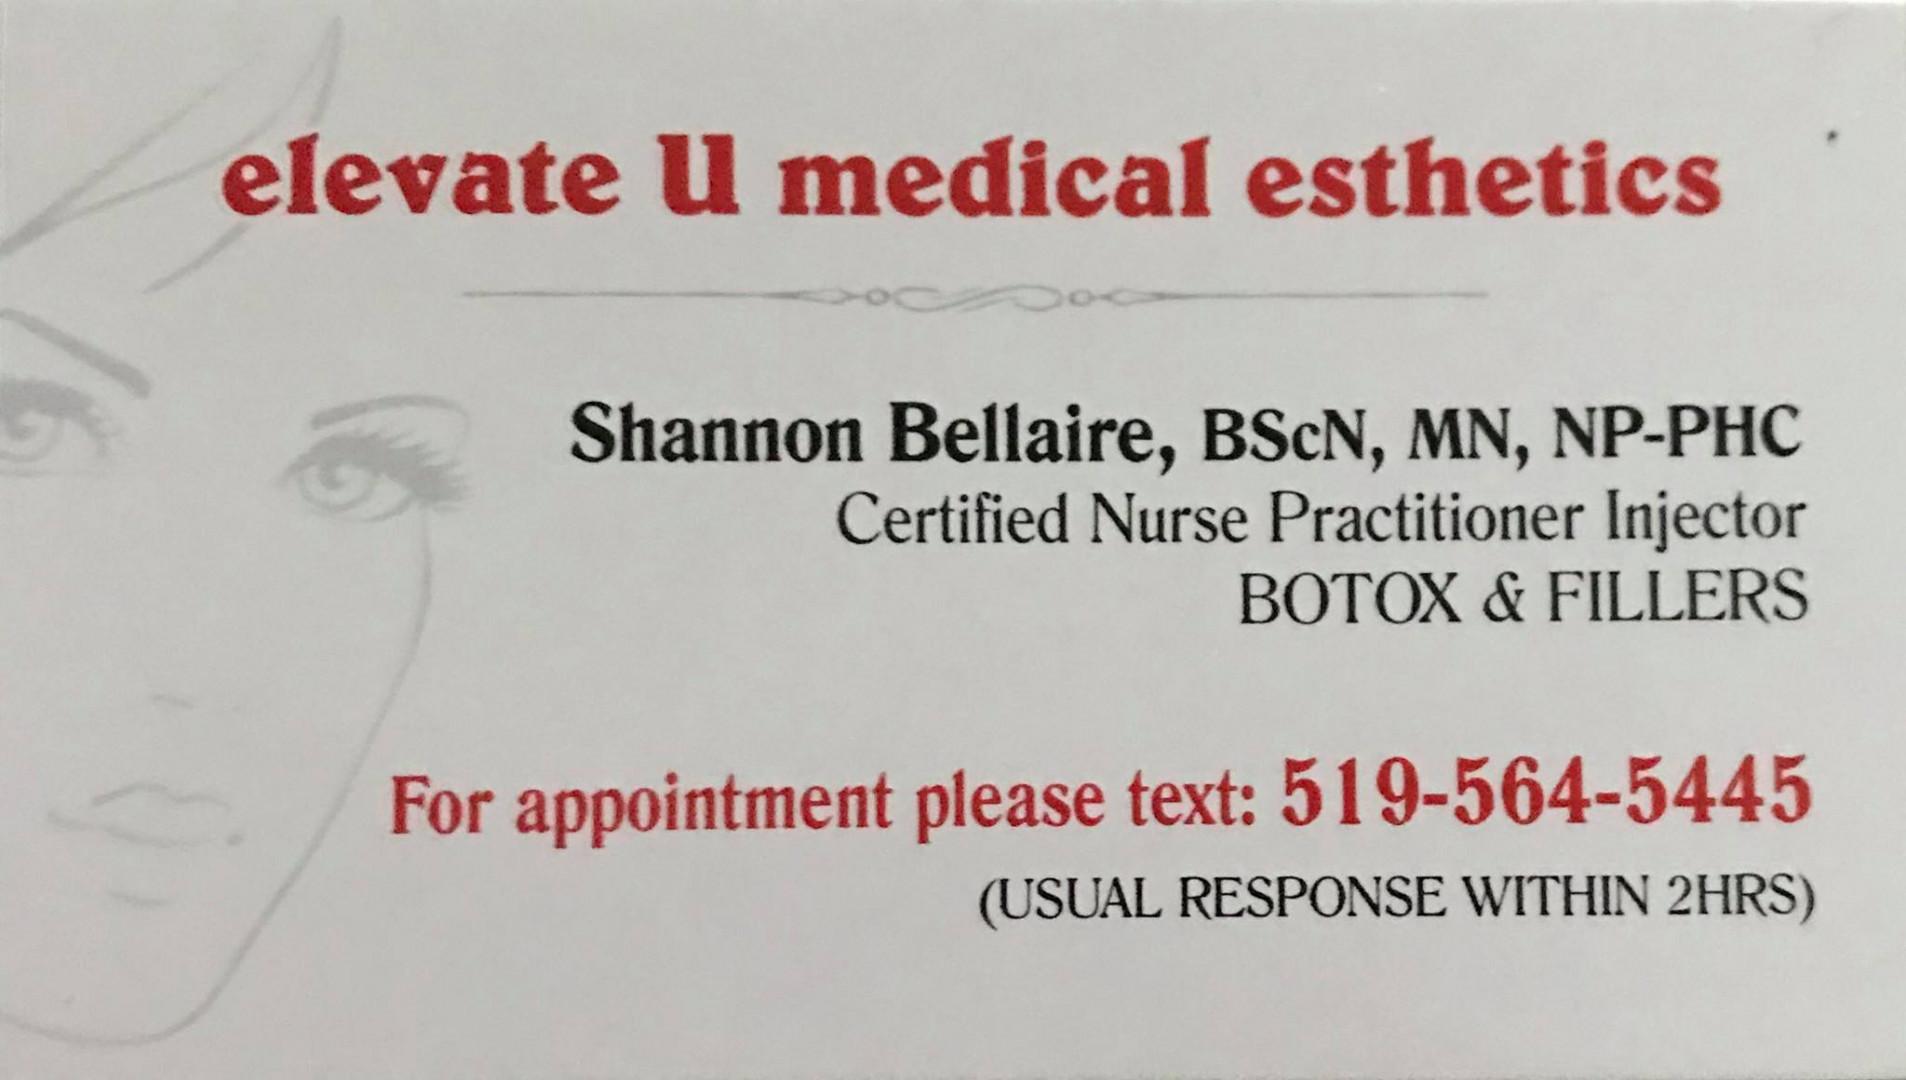 Elevate U Medical Esthetics